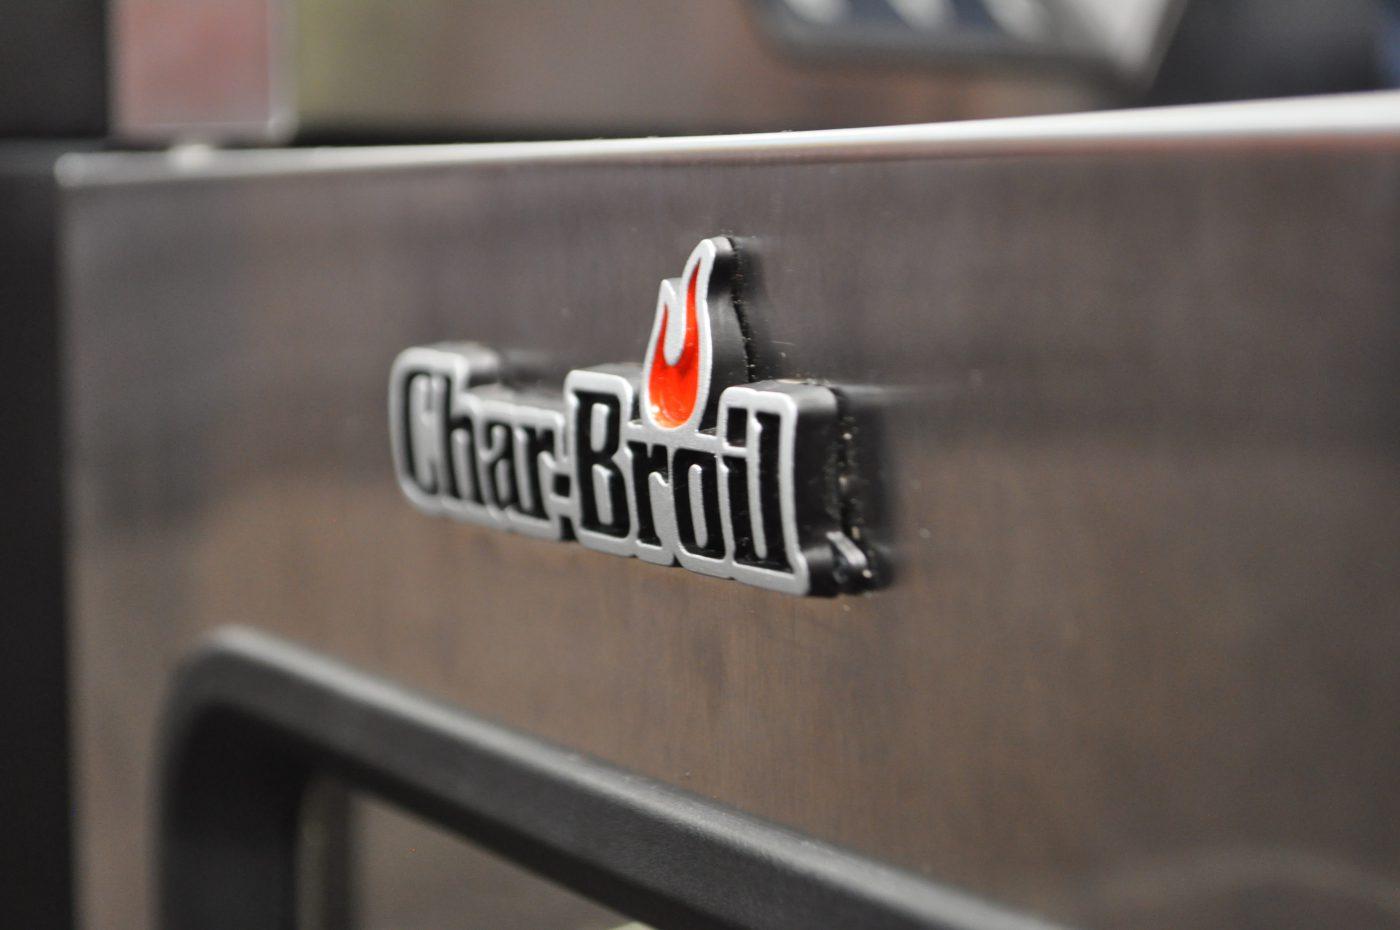 Char Broil – Spoga 2016